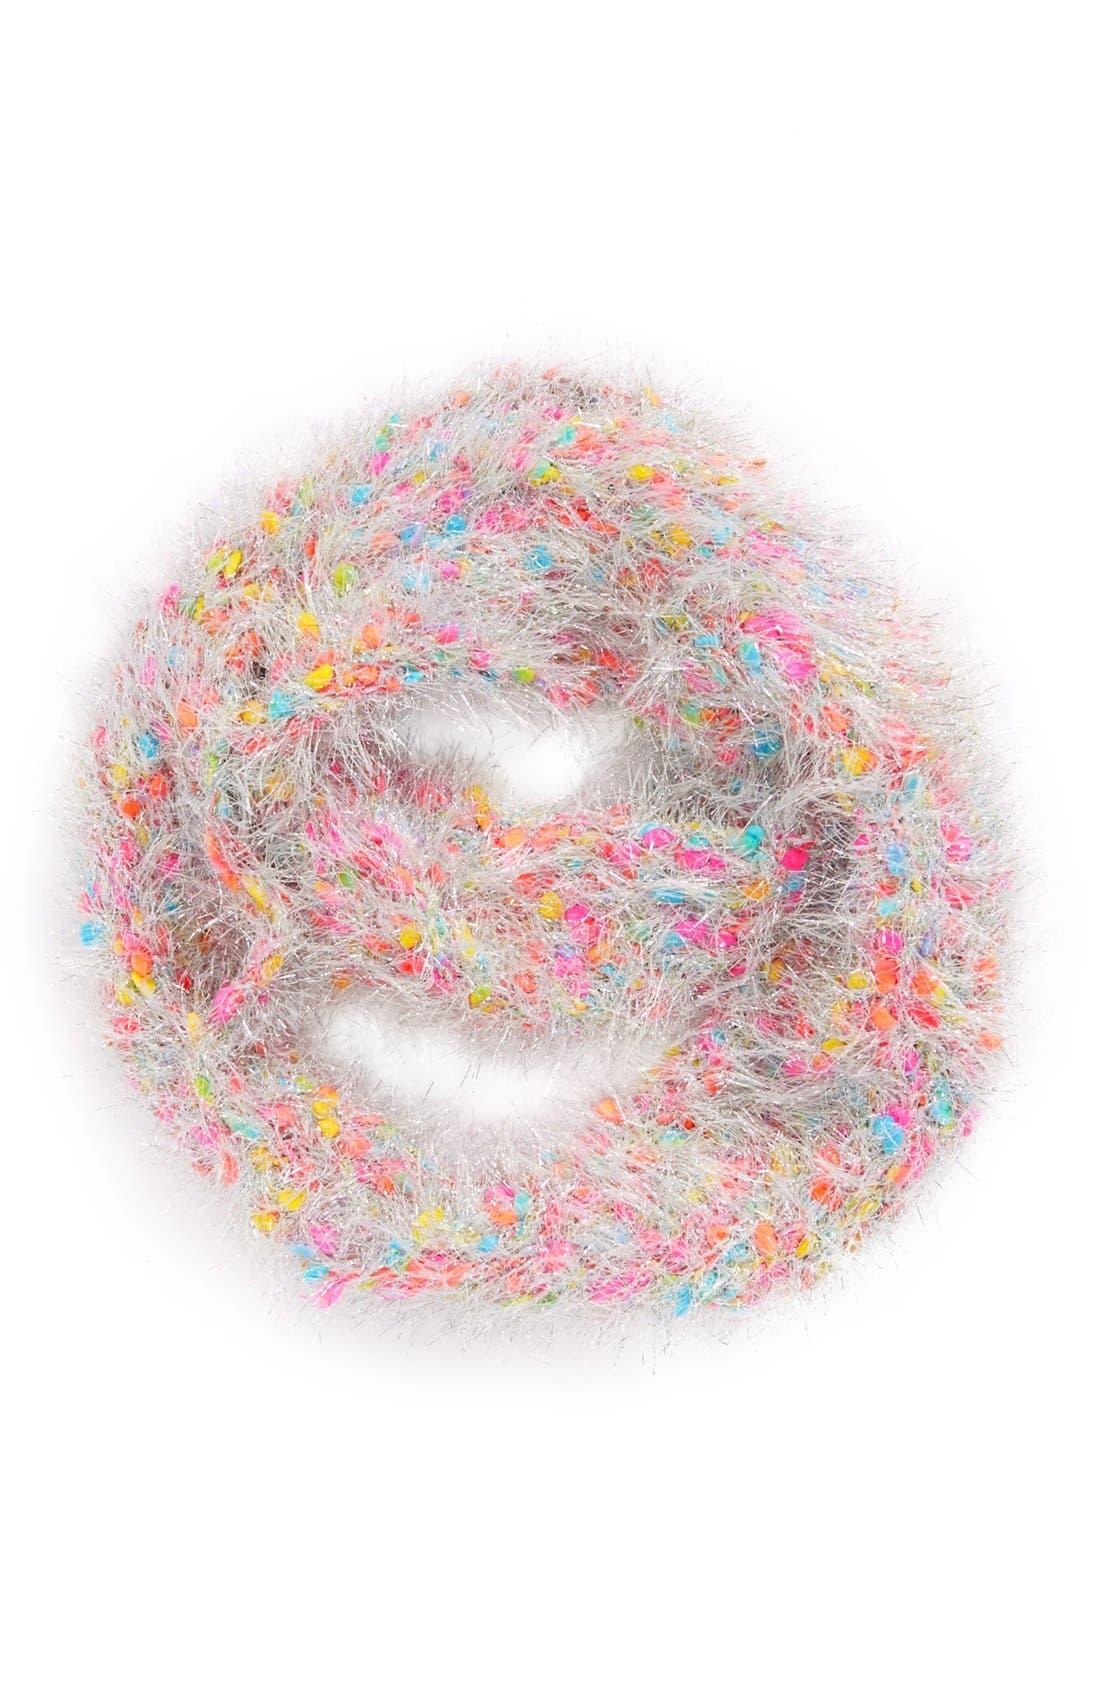 Alternate Image 1 Selected - Peace of Cake 'Sparkle Popcorn' Infinity Scarf (Girls)